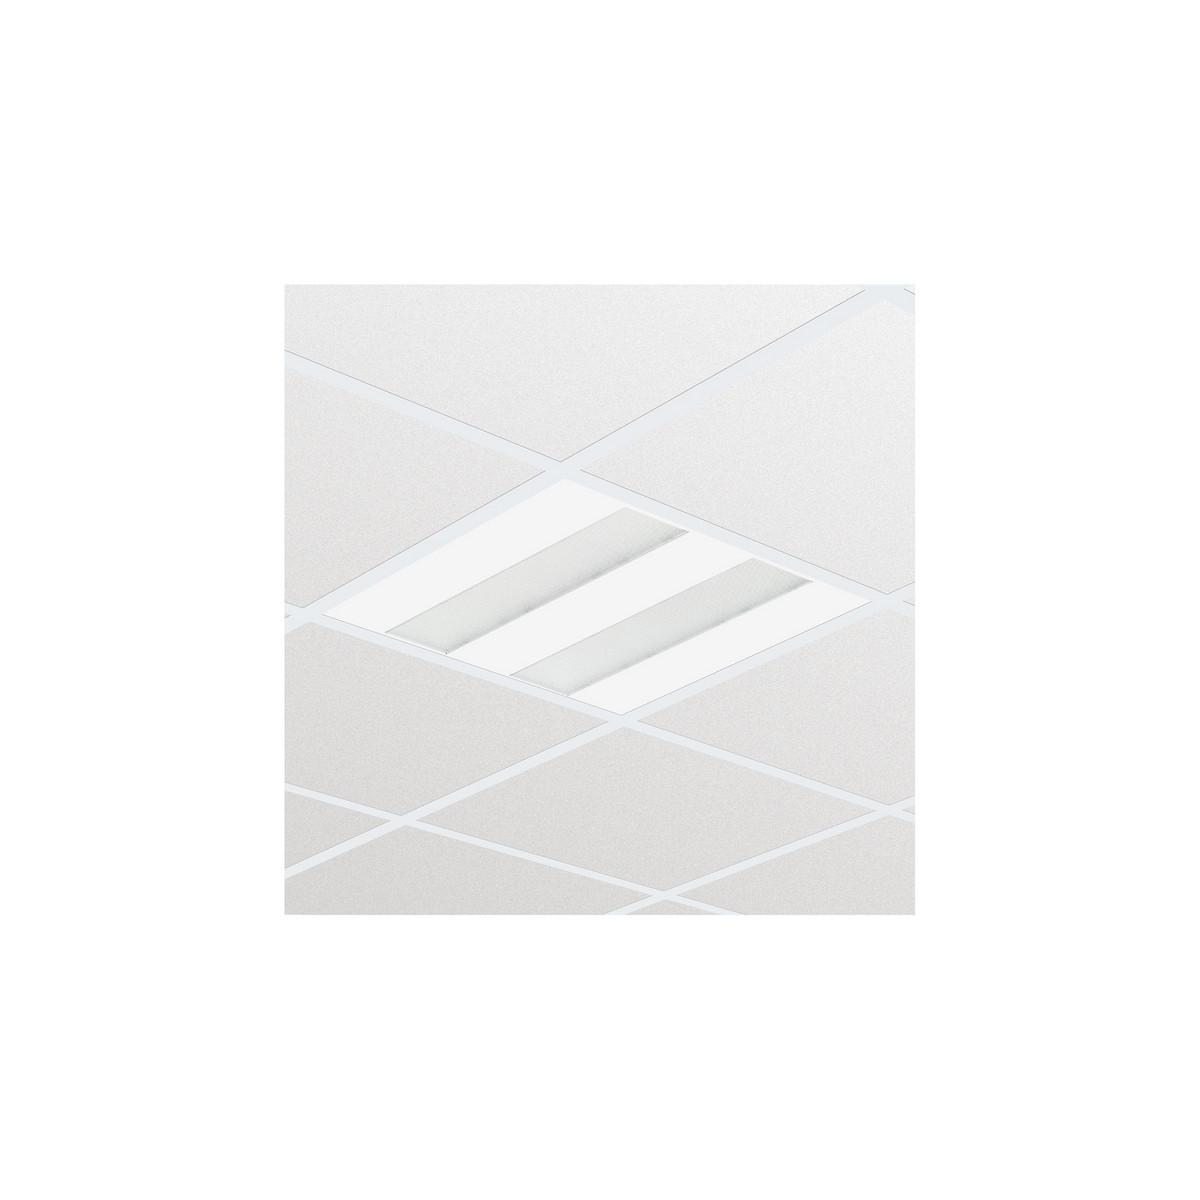 Philips FlexBlend Indbyg RC340B LED 4200lm/940 DALI 60x60 Synlig T-skinne PCS-optik